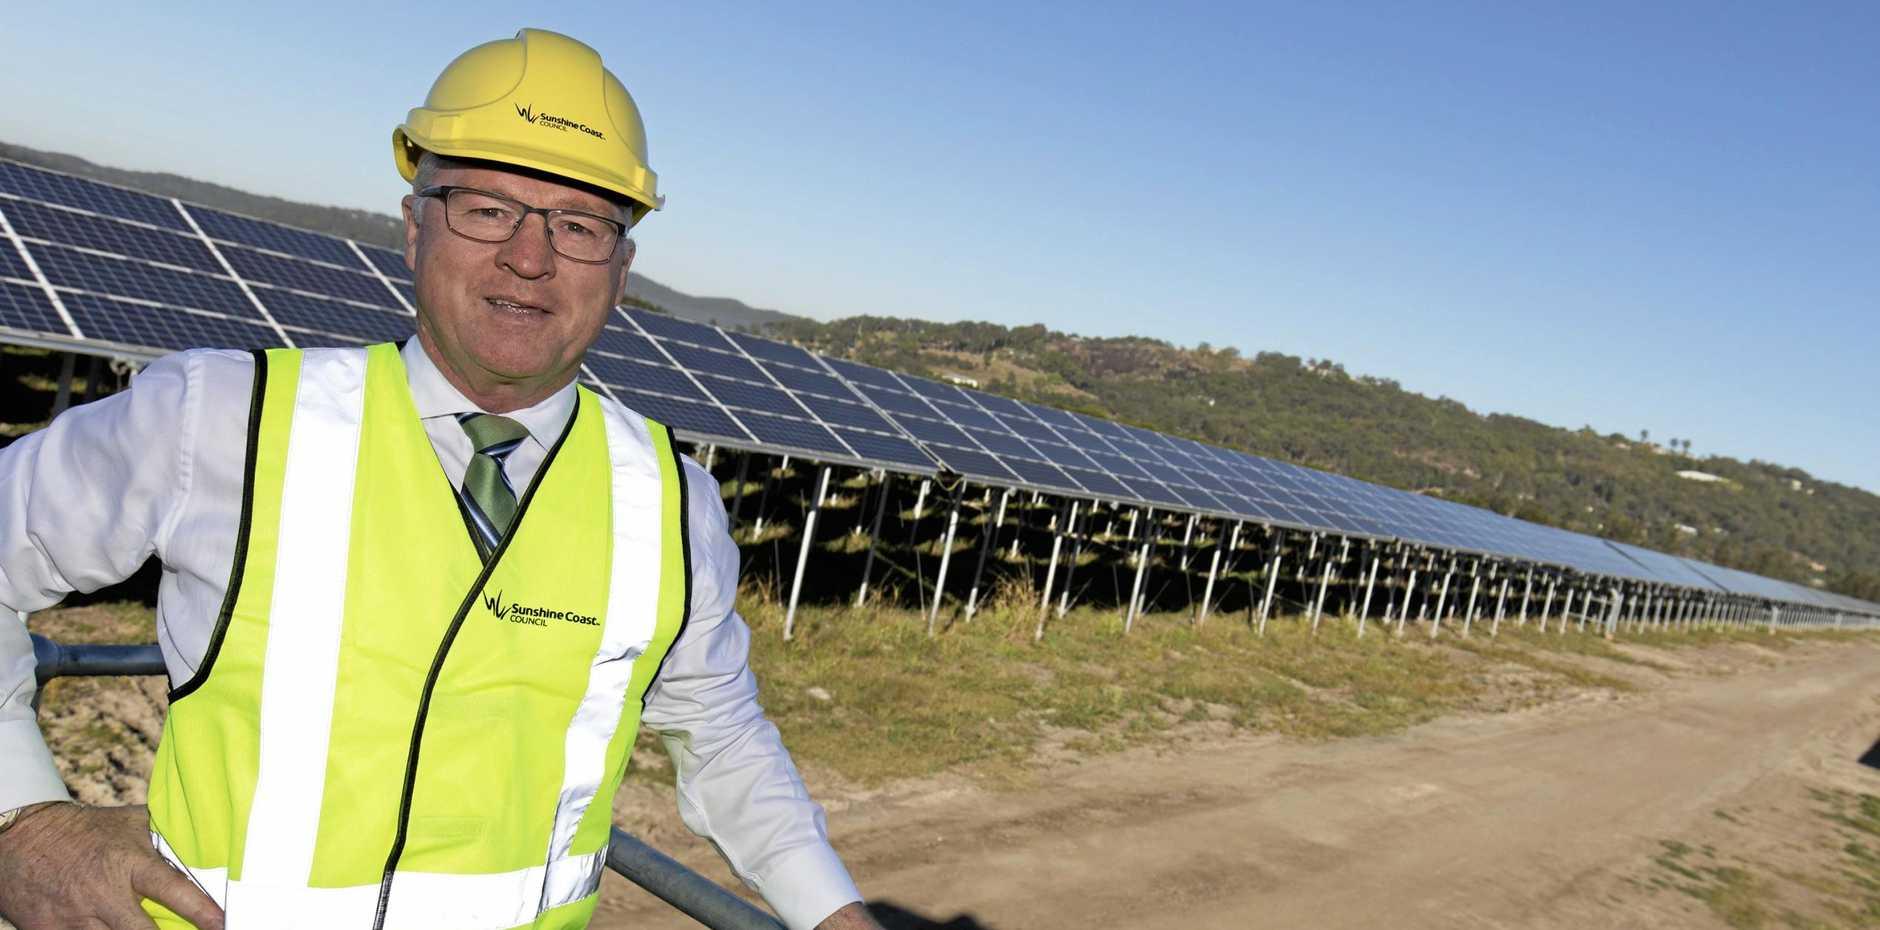 Mayor Mark Jamieson at the Valdora Solar Farm